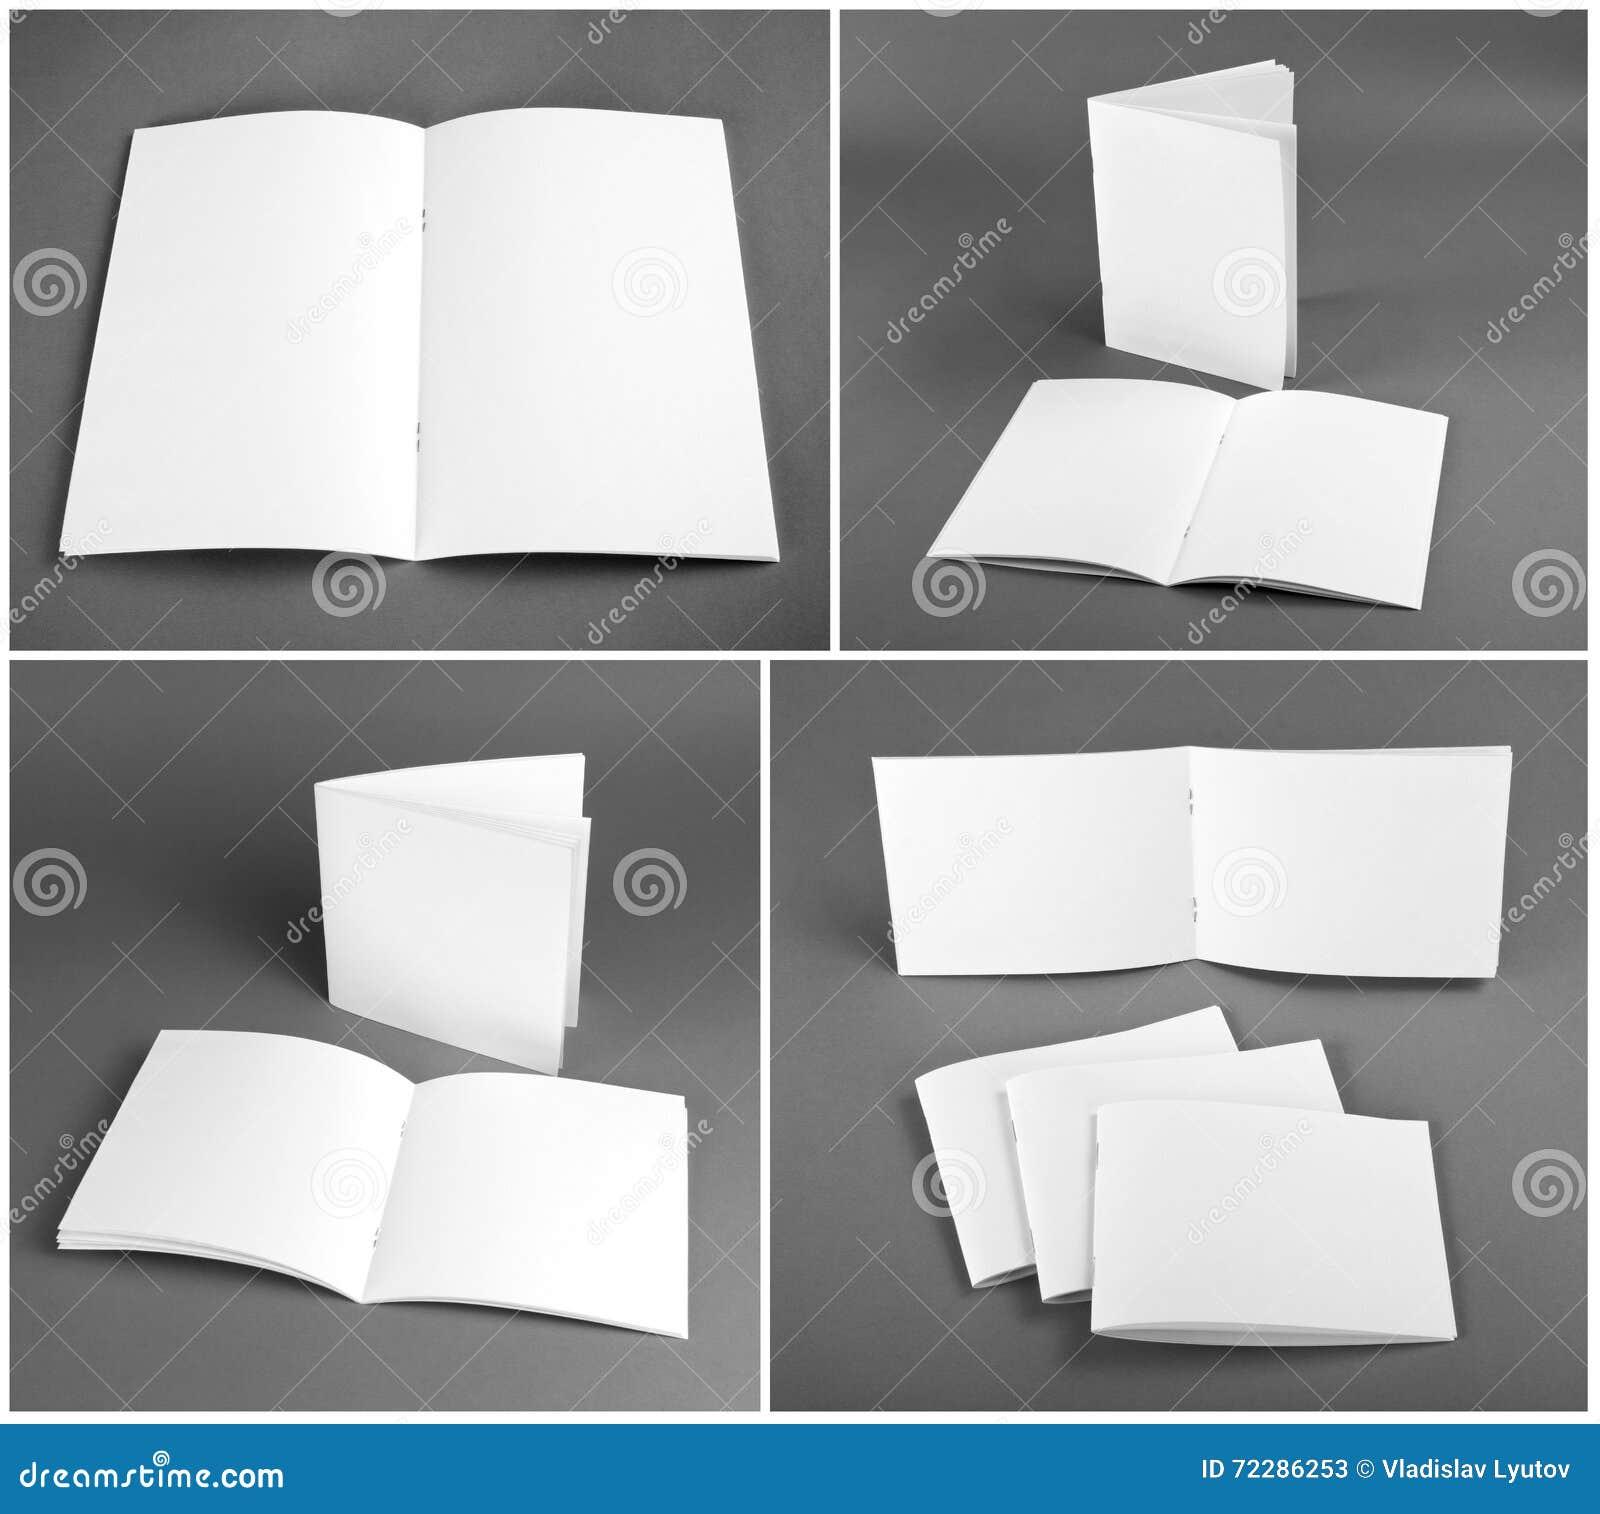 Pusty katalog, broszurka, magazyny, książka egzamin próbny up